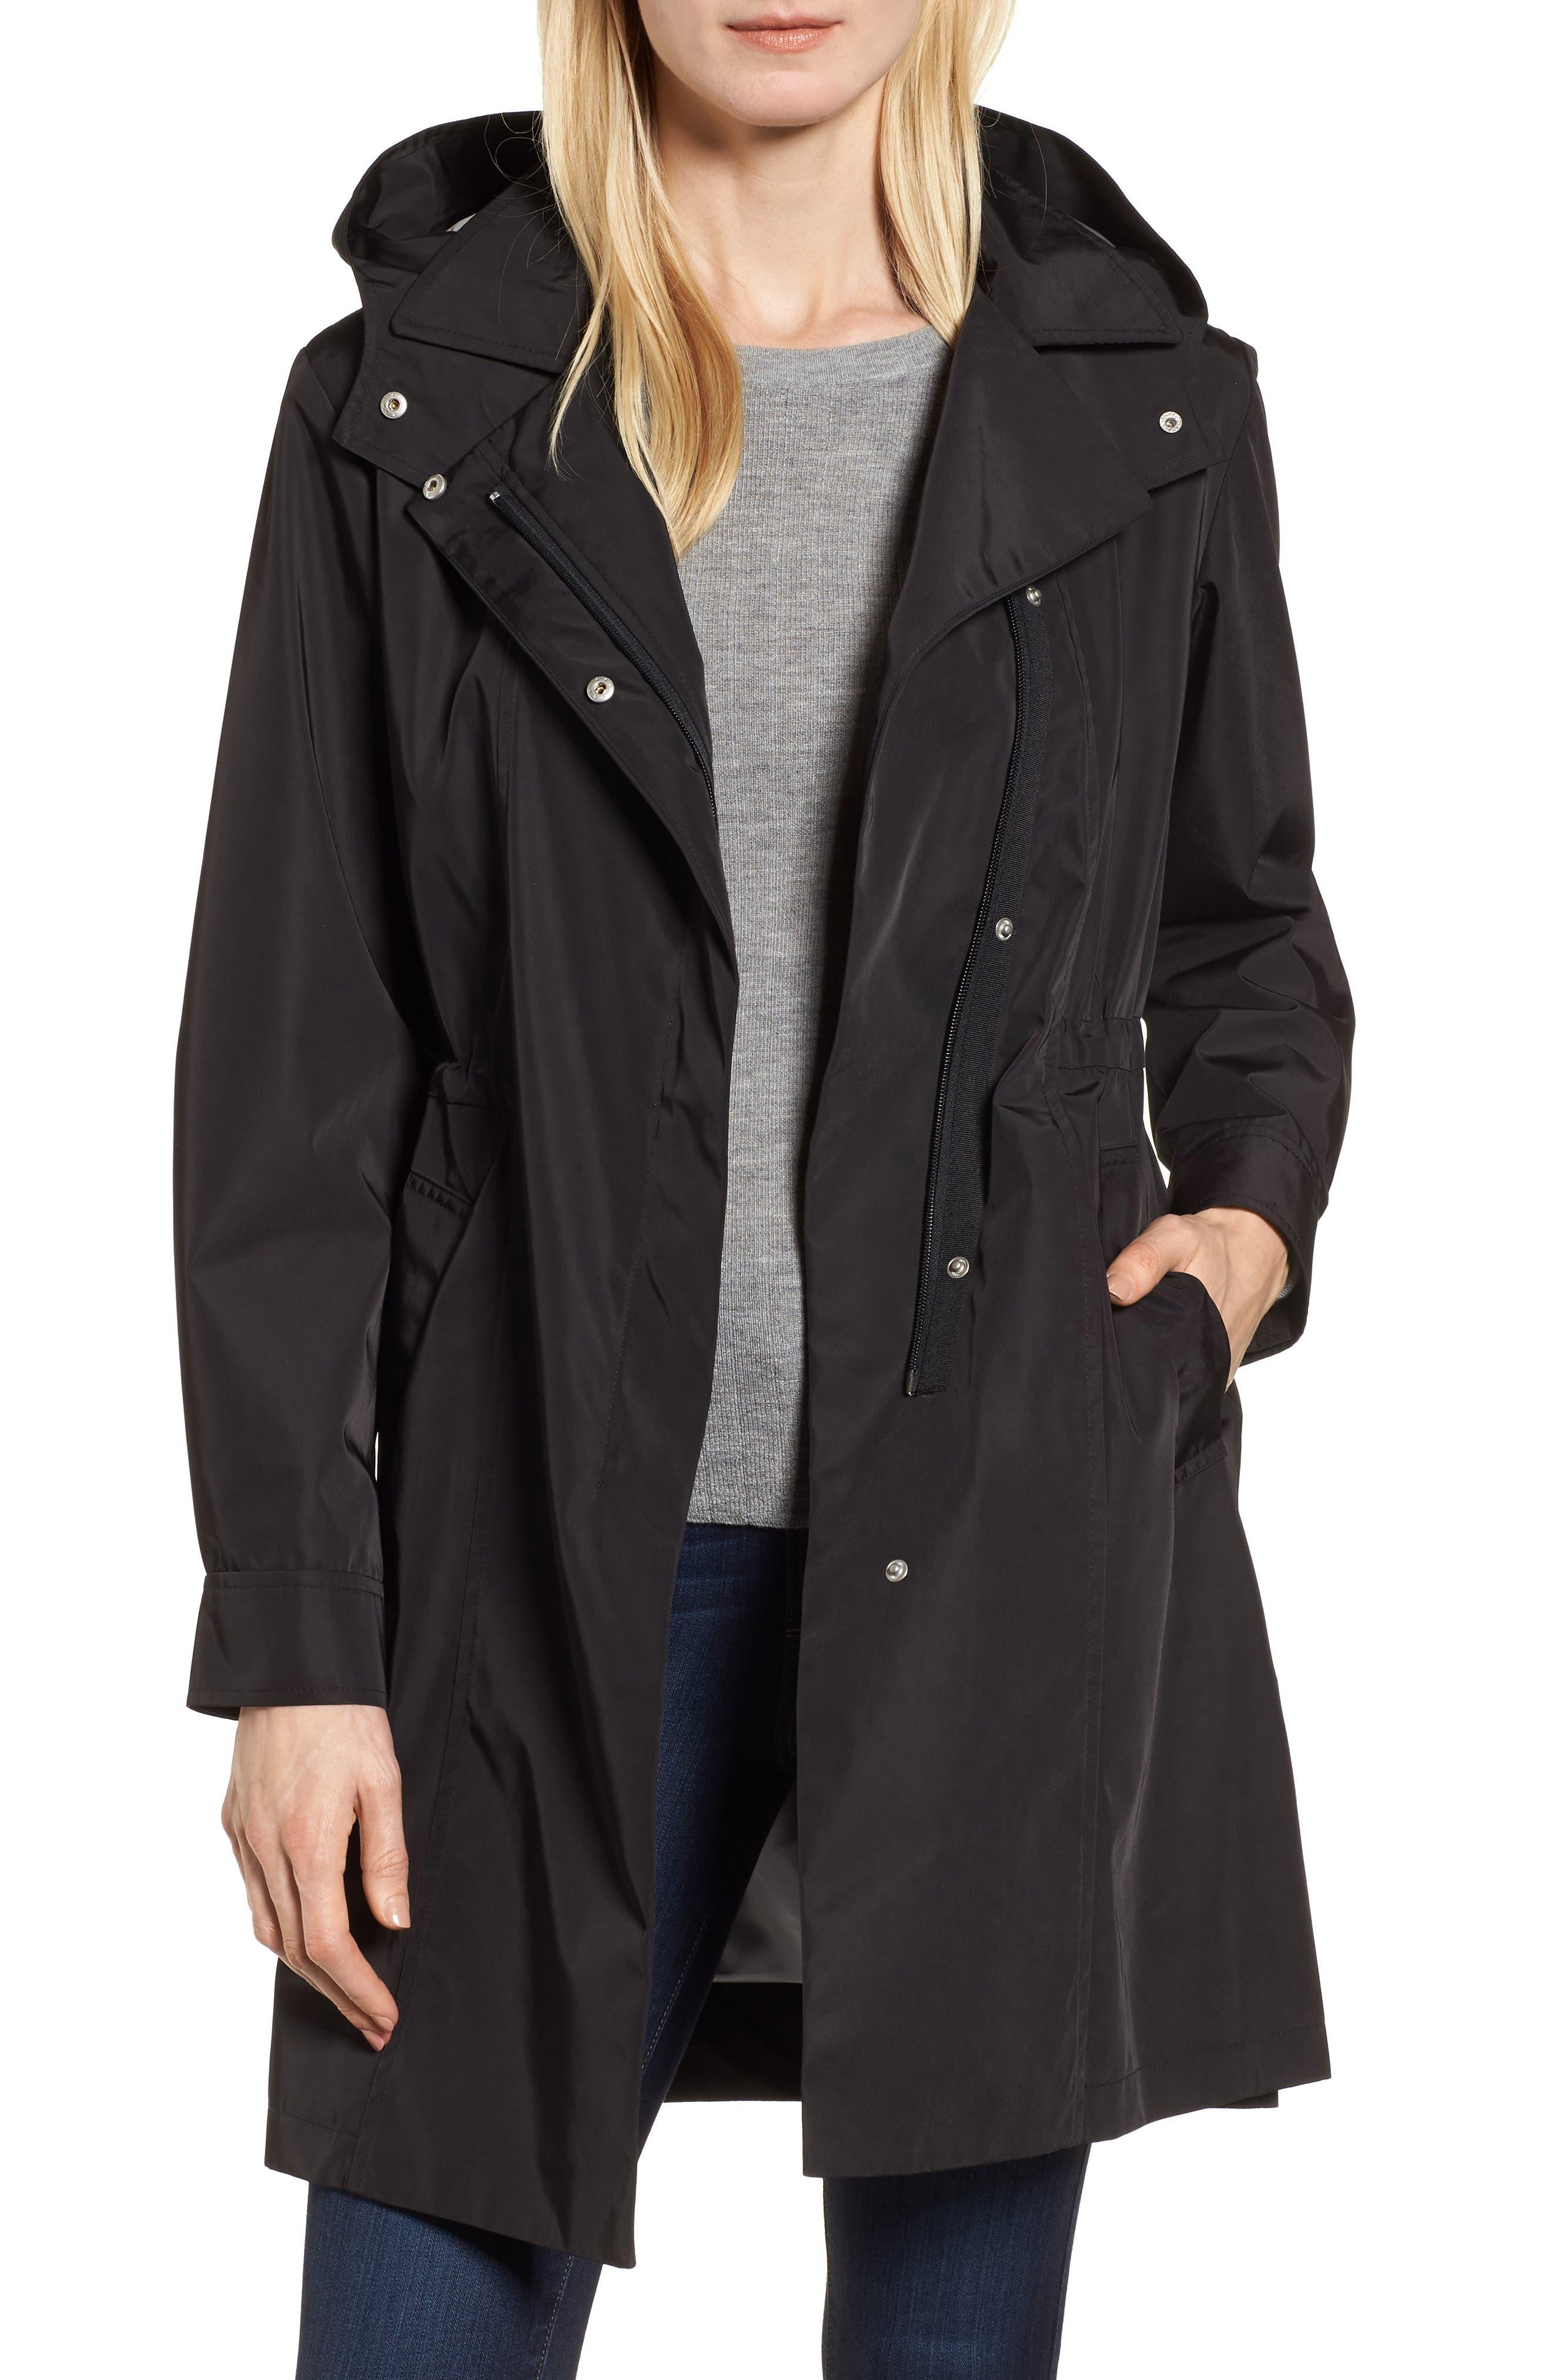 KRISTEN BLAKE, Tech Hooded Trench Coat, Main thumbnail 1, color, BLACK